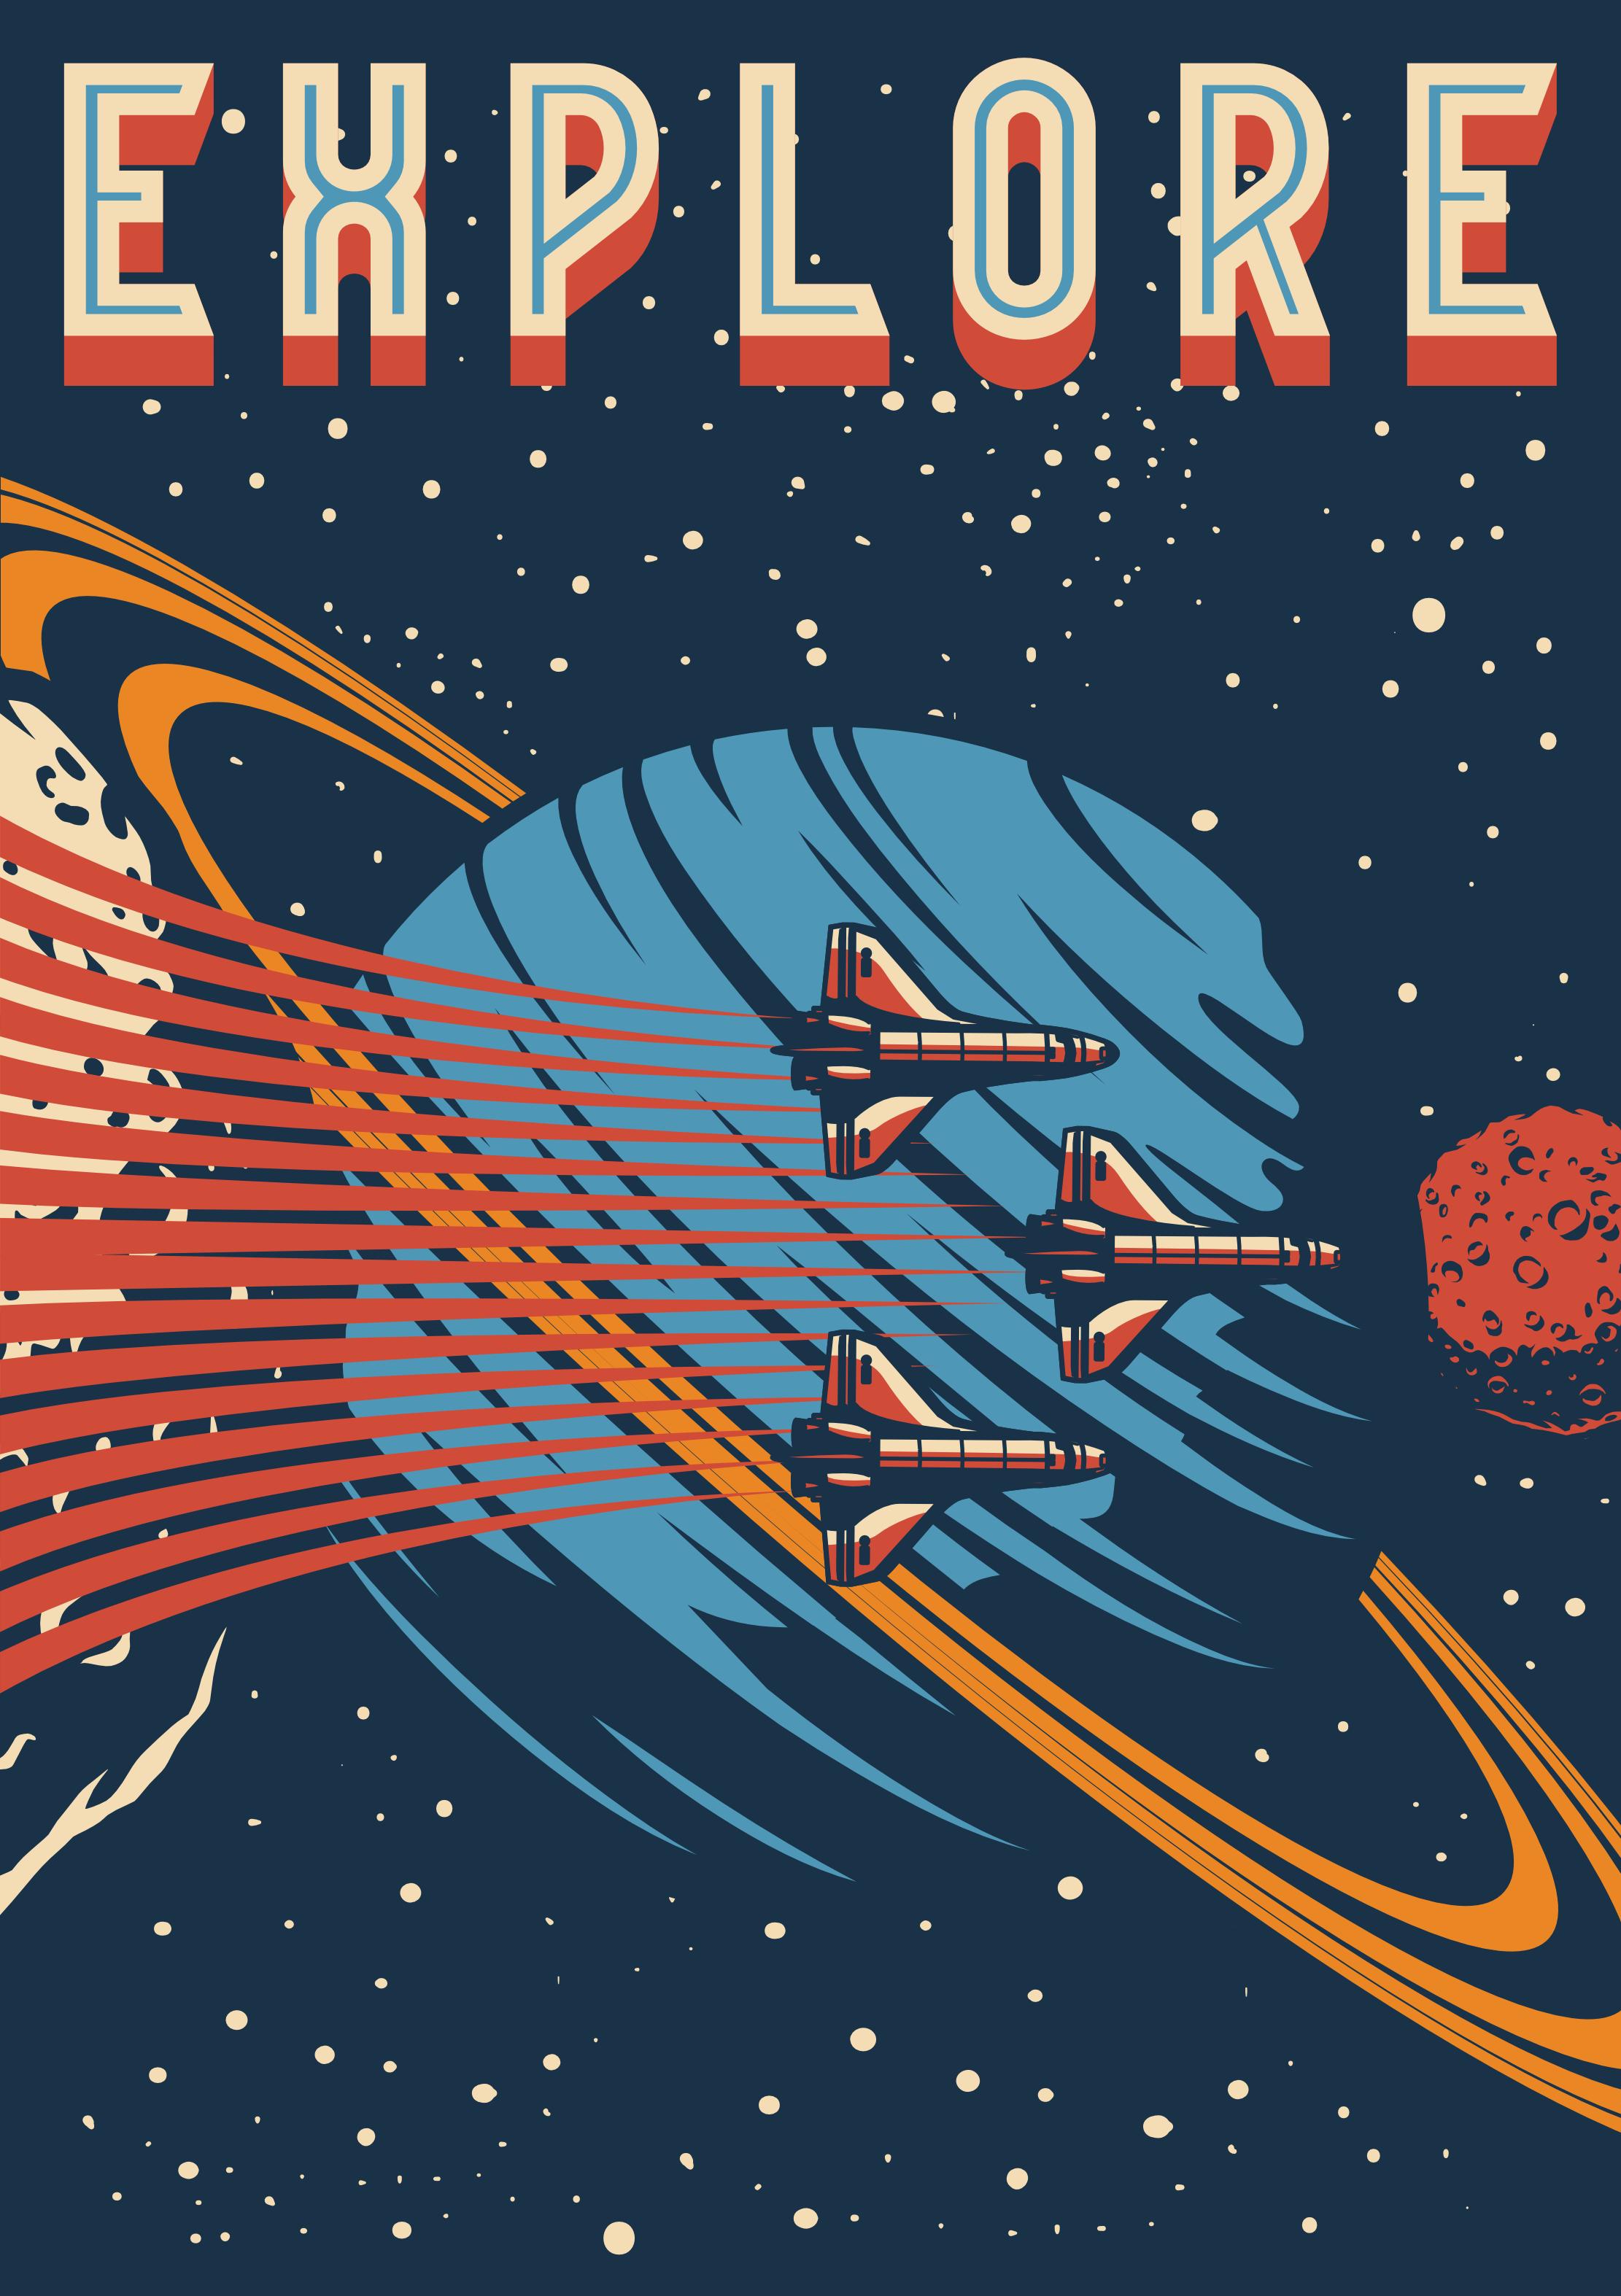 Space Art - Mars Travel - Go to Mars - Space Travel - Motivational Art